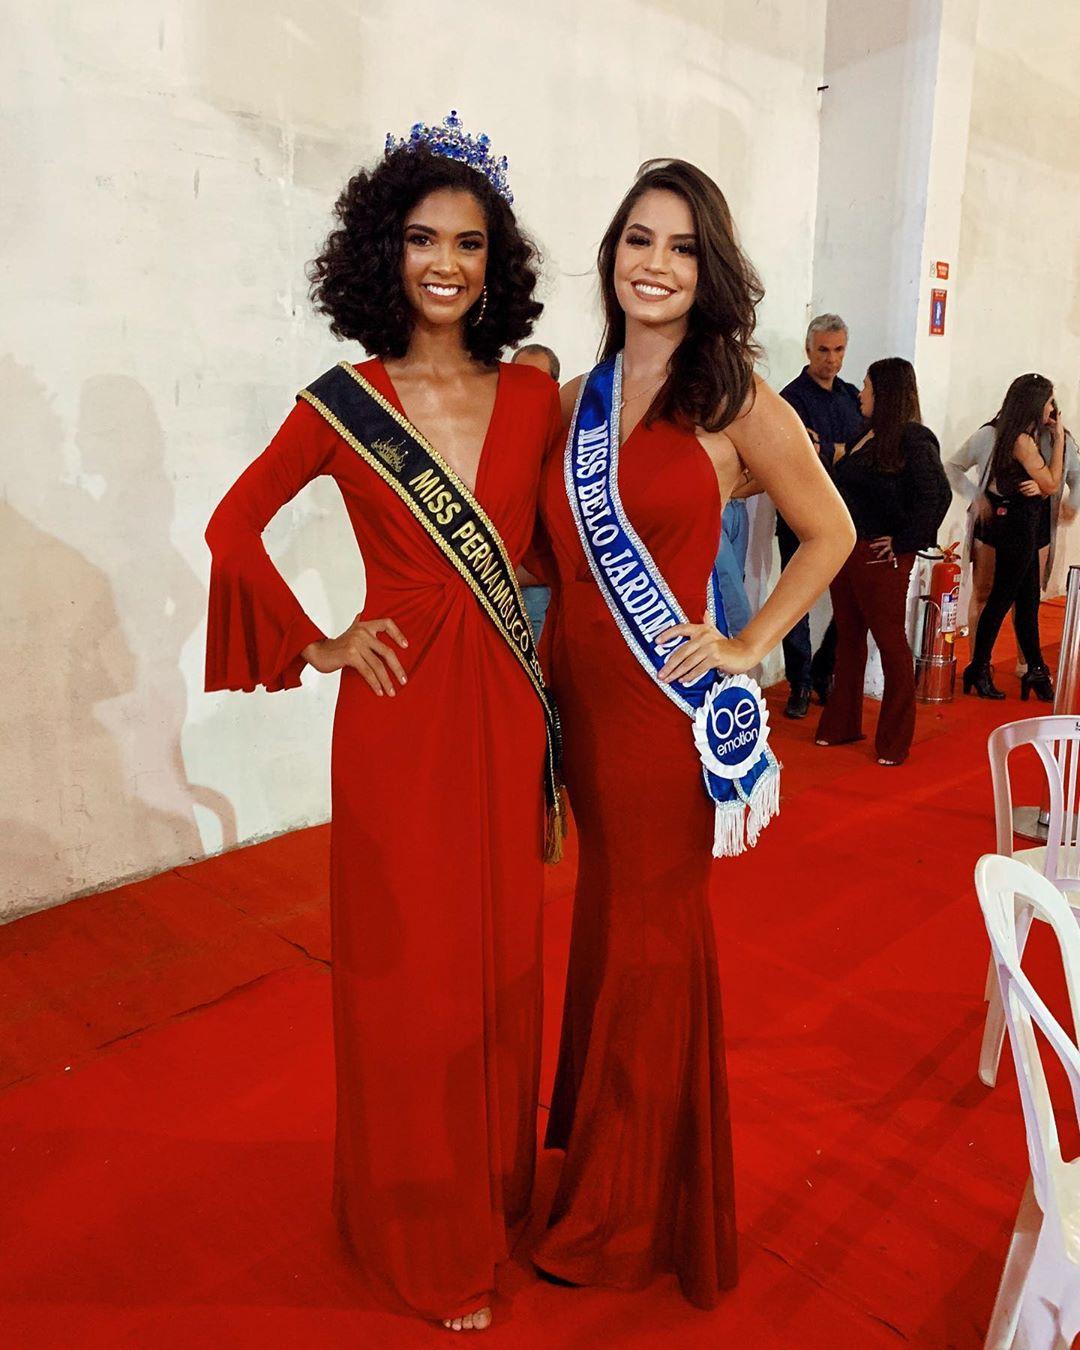 barbara souza, miss pernambuco 2019. - Página 5 81669610